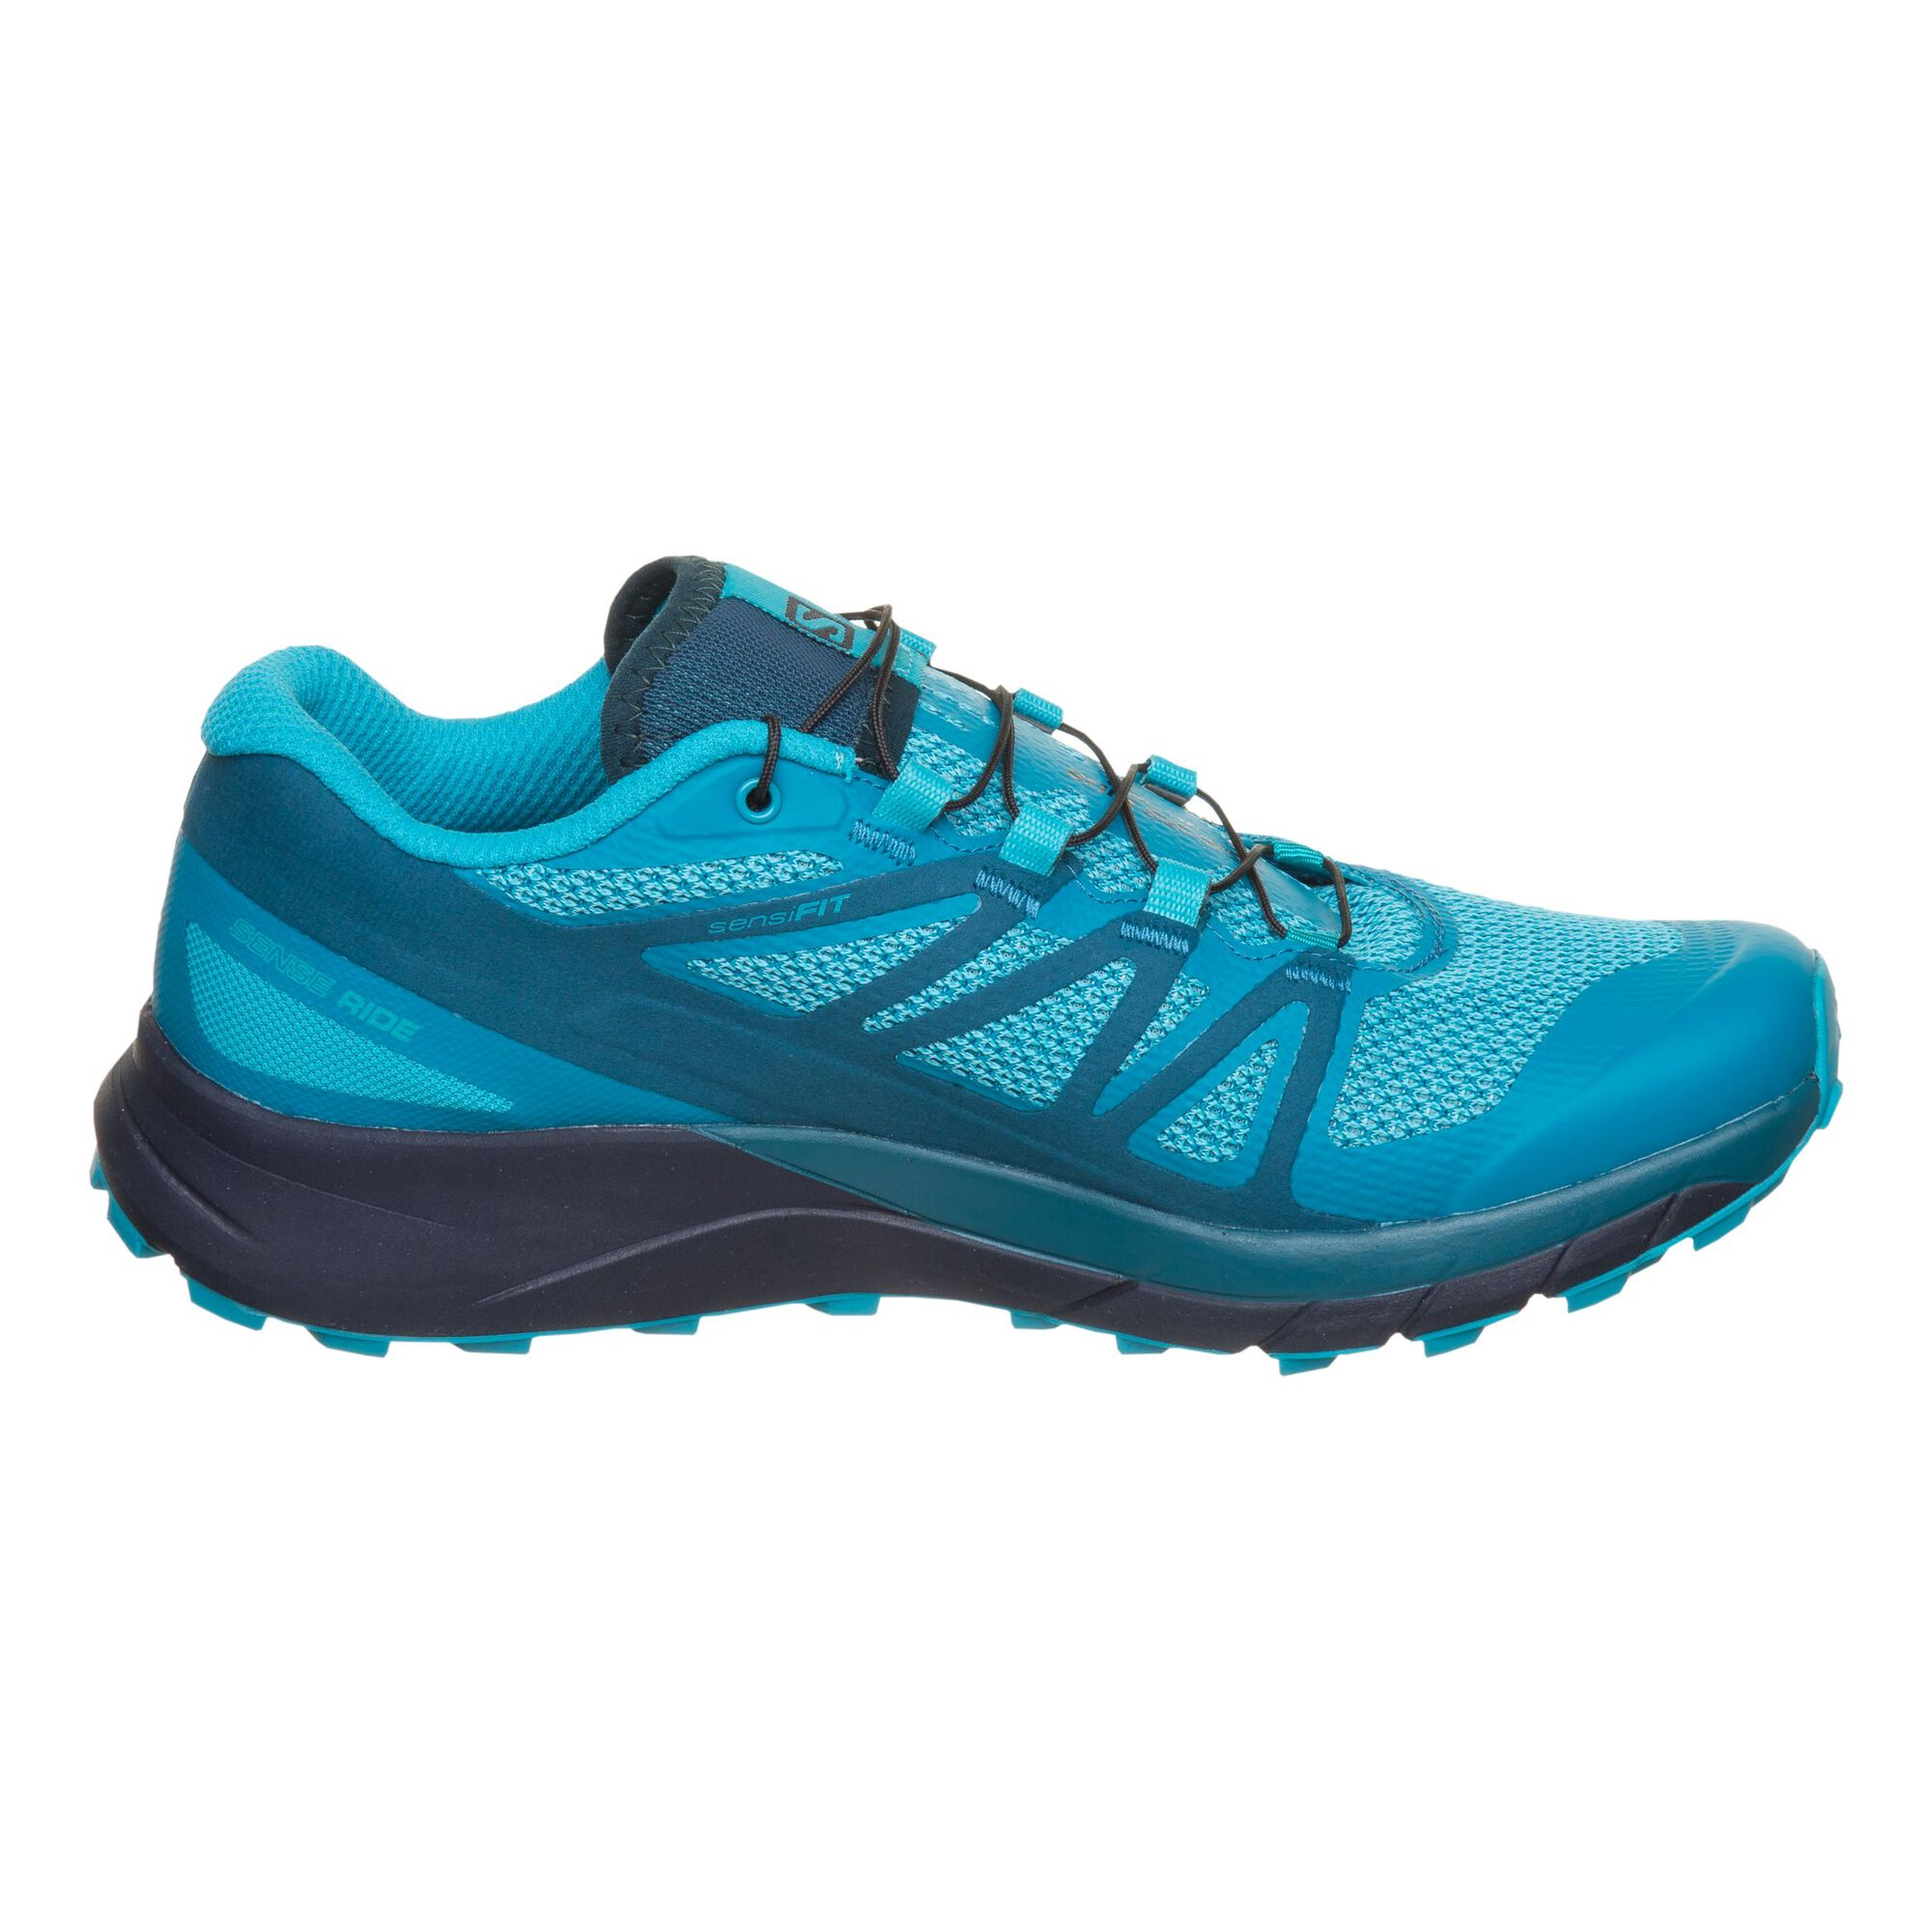 9b044dc9268a buy Salomon Sense Ride Trail Running Shoe Women - Turquoise